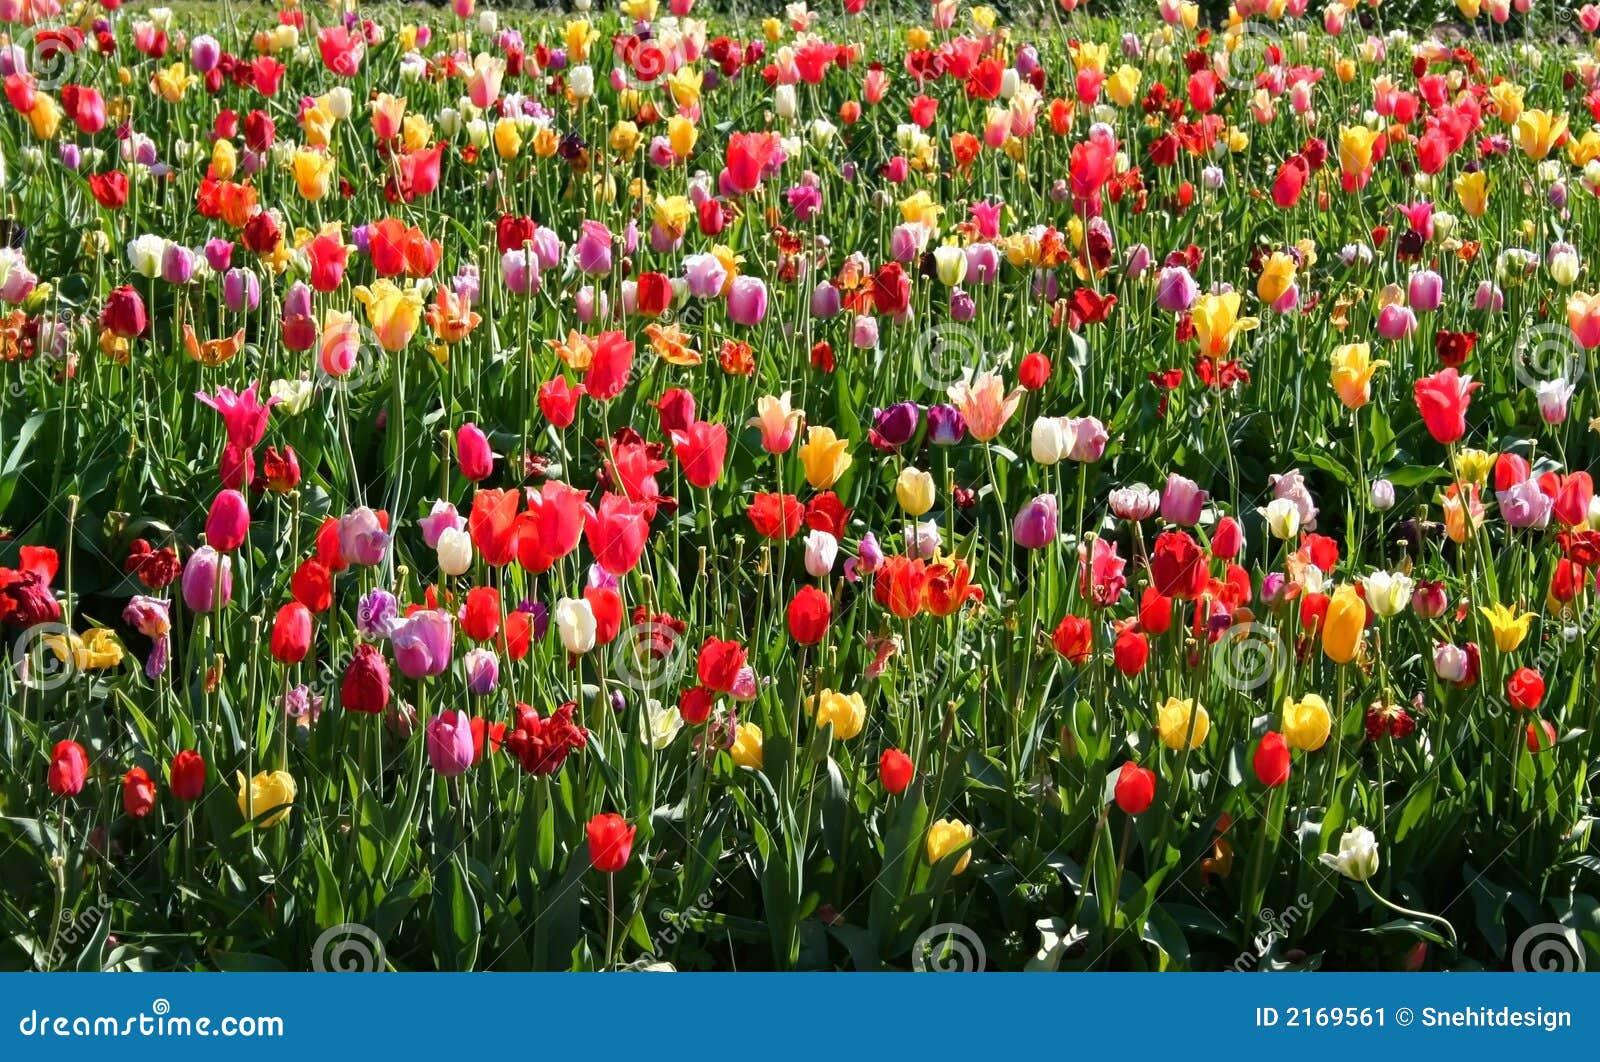 multi farbige tulpen stockbild bild von holl ndisch sommer 2169561. Black Bedroom Furniture Sets. Home Design Ideas